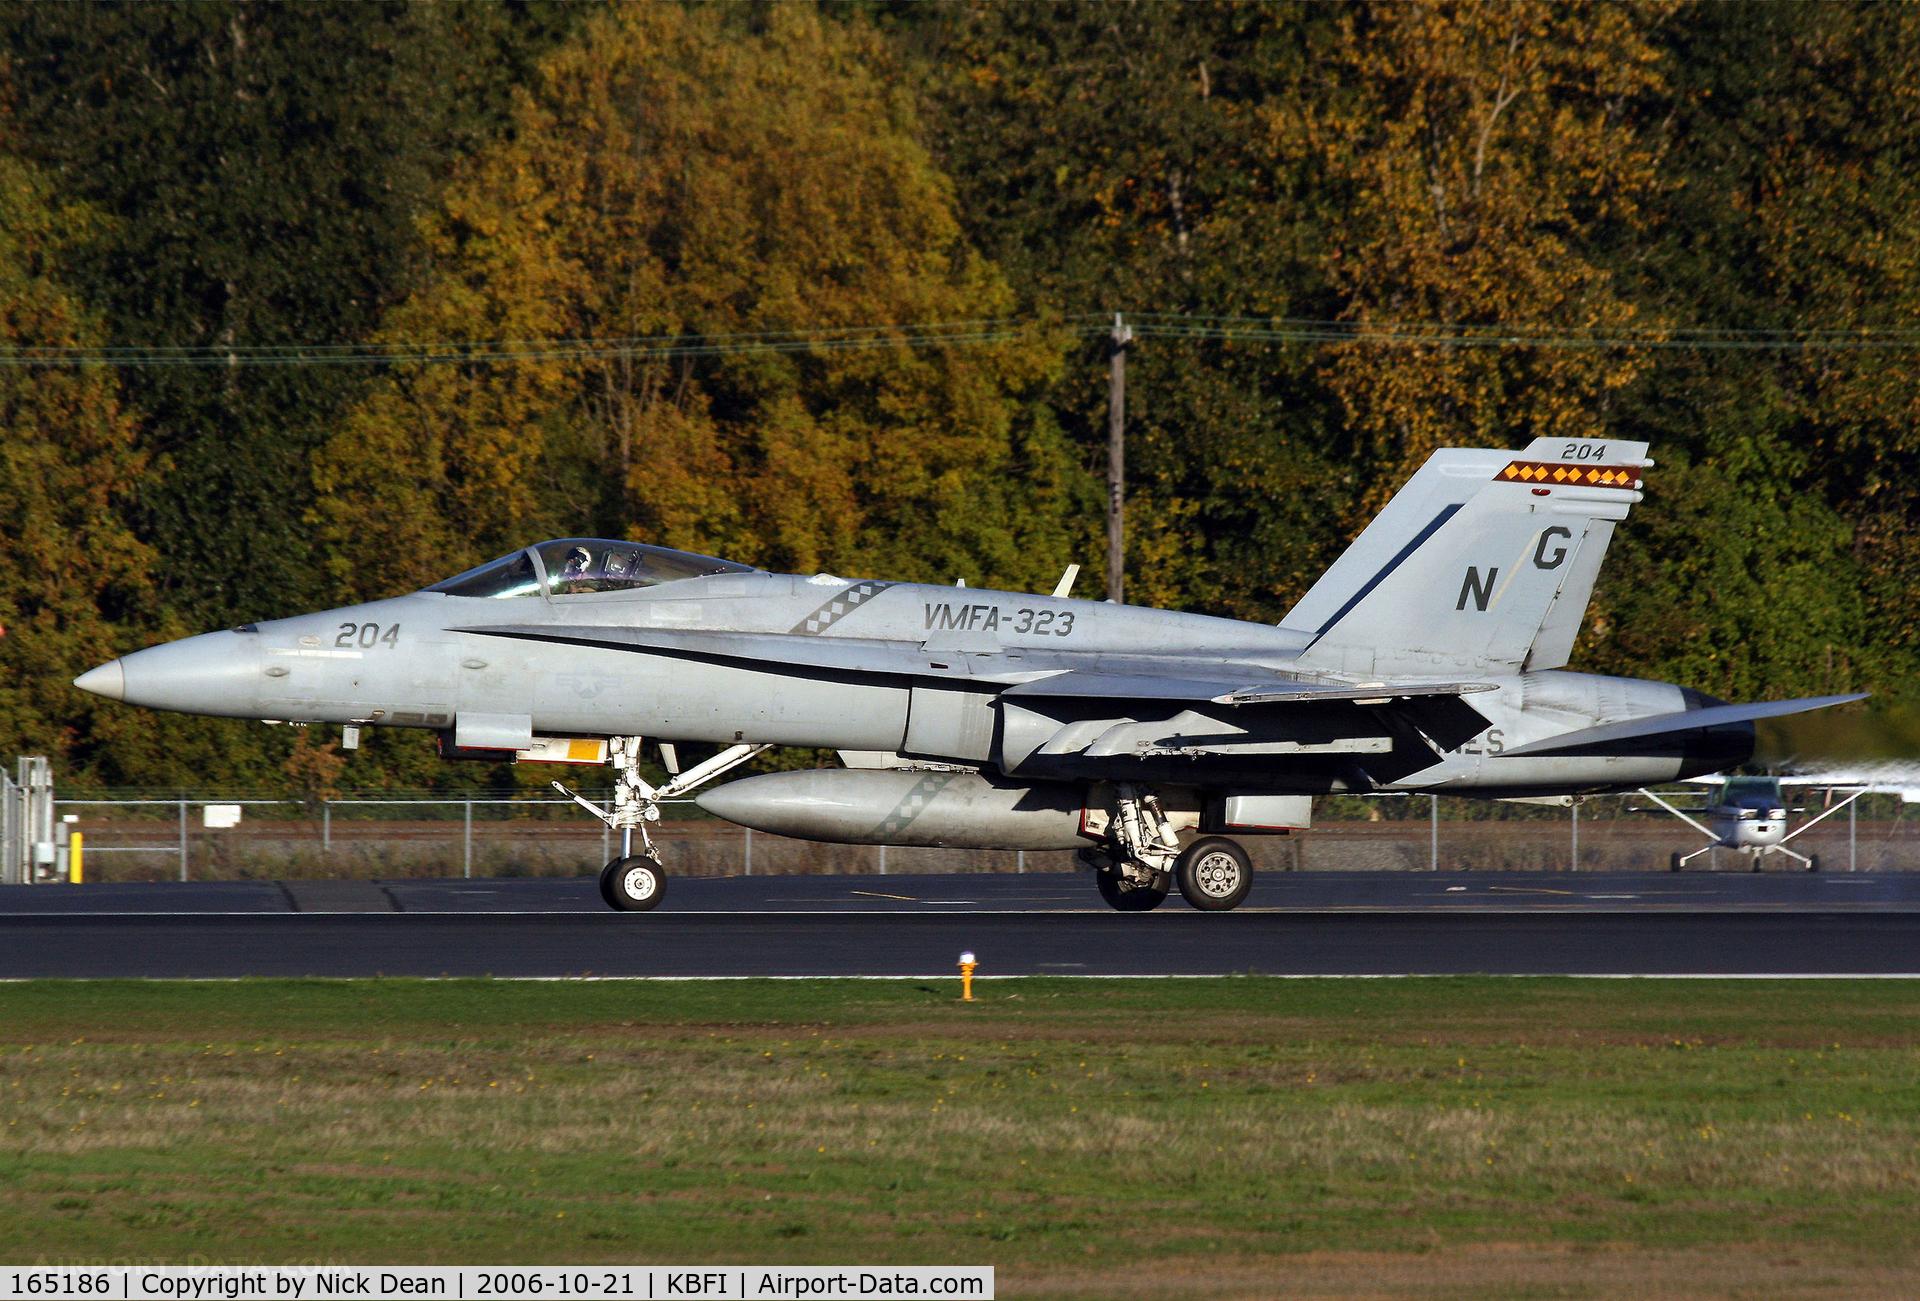 165186, McDonnell Douglas F/A-18C Hornet C/N 1311, KBFI VMFA-323 coded NG 204